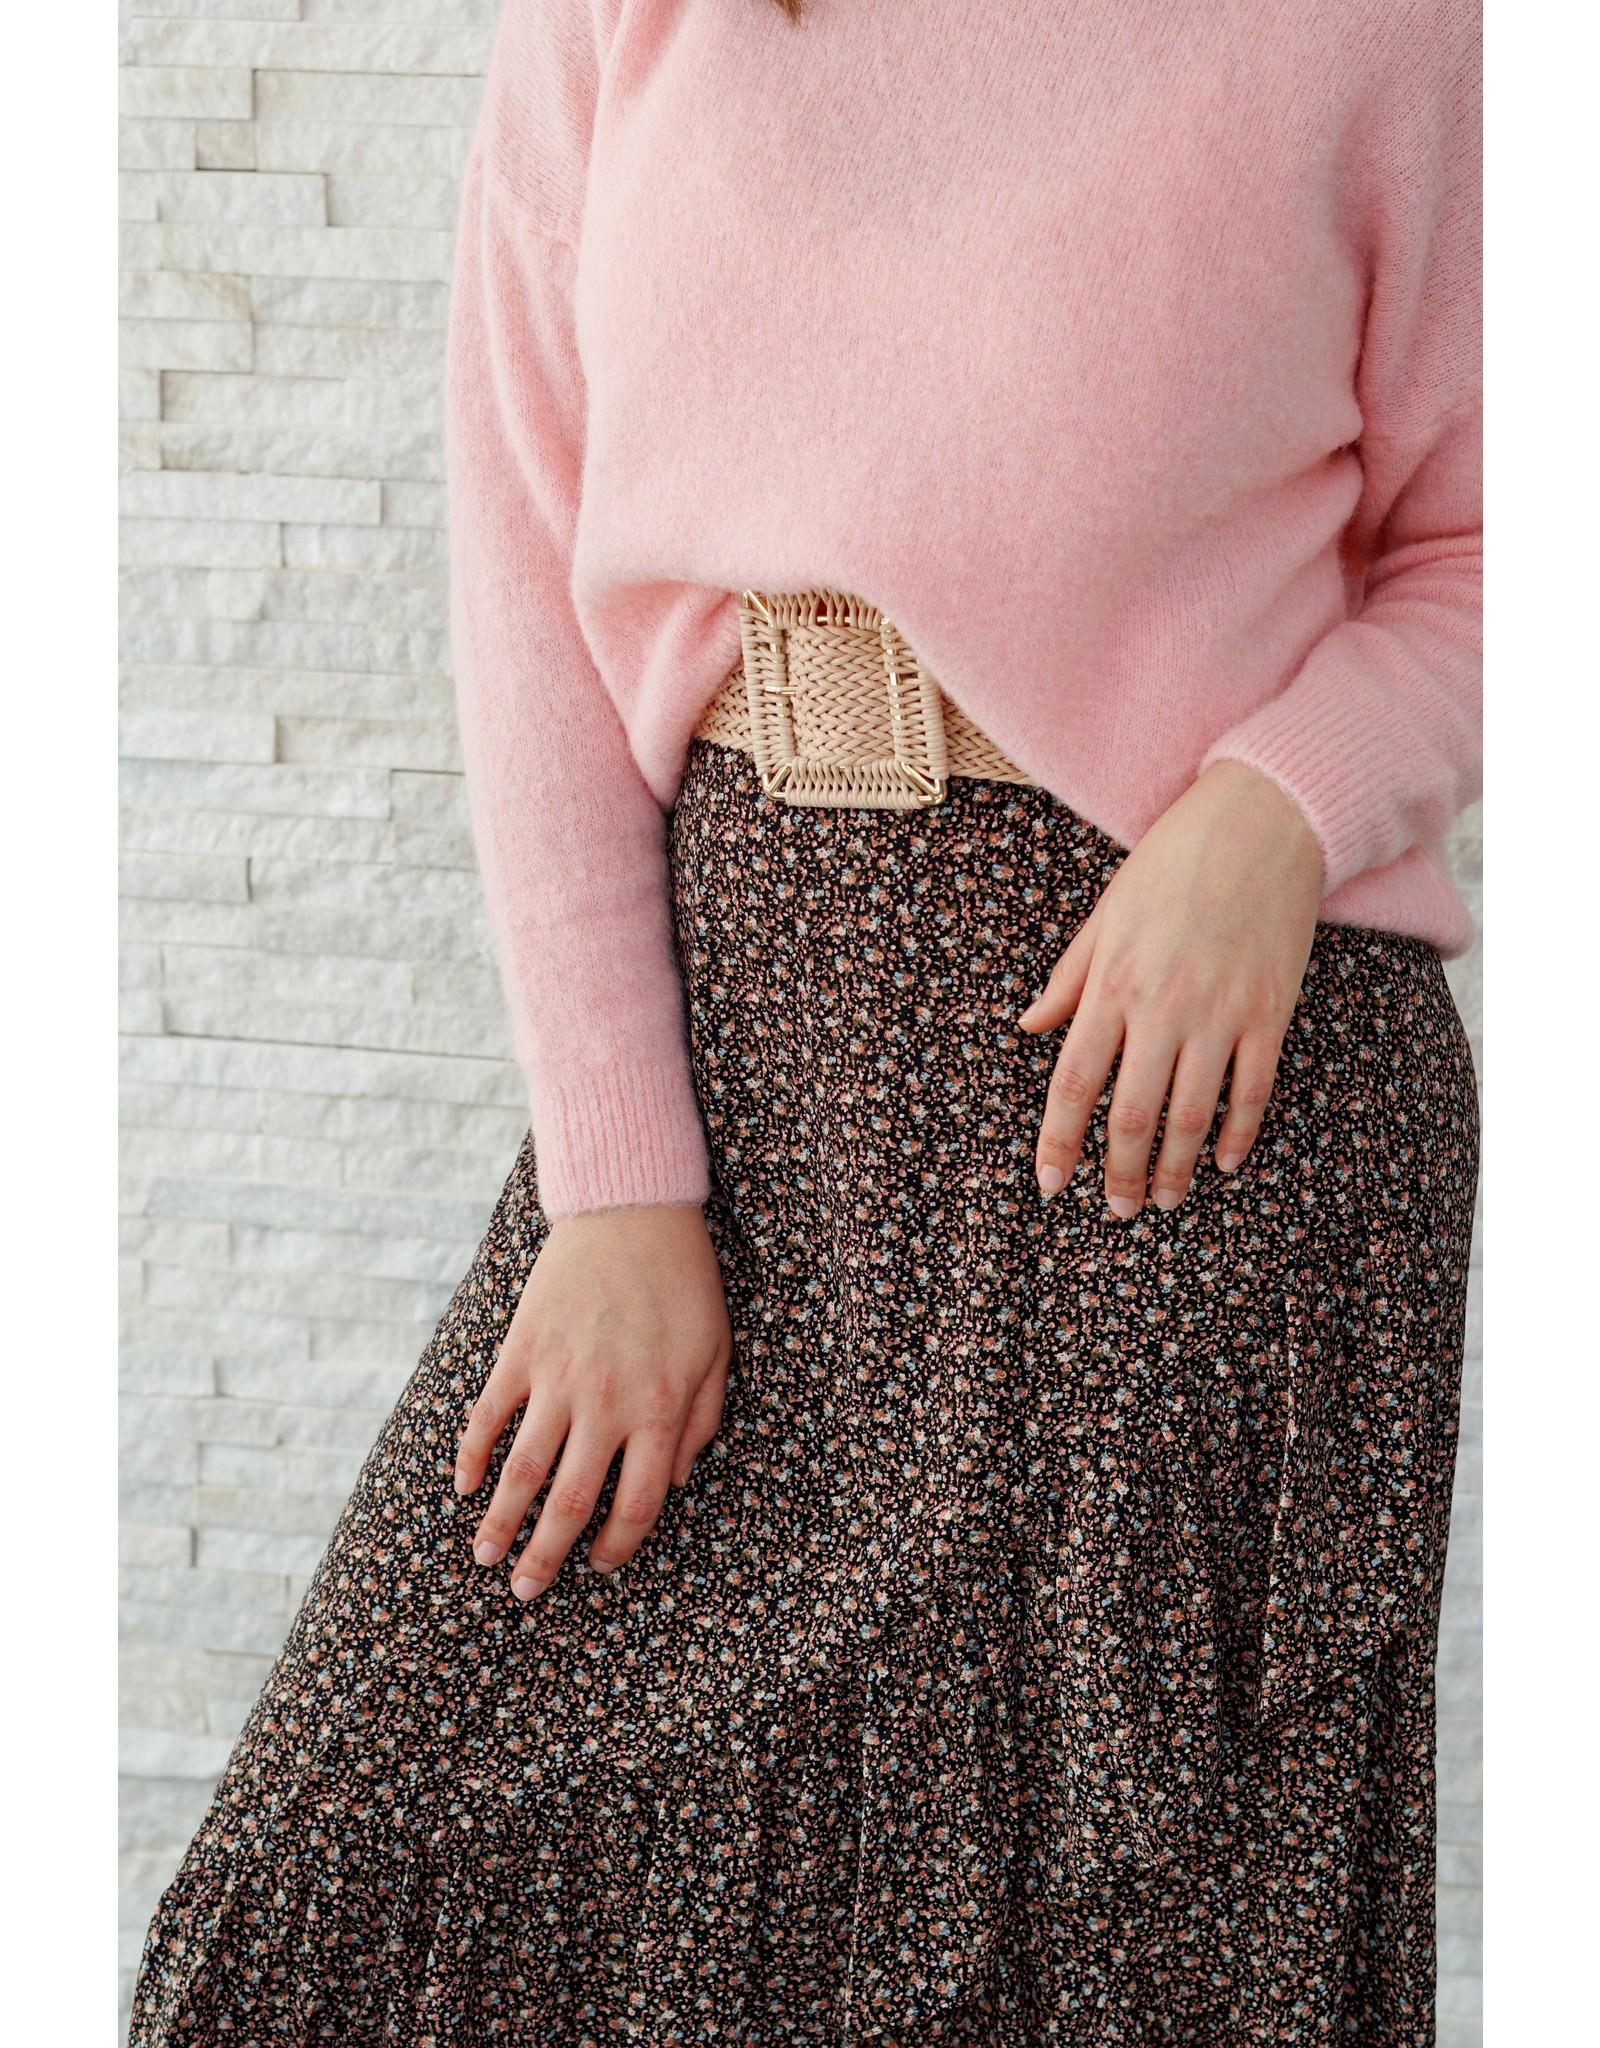 Mika Elles Sweet pink love sweater